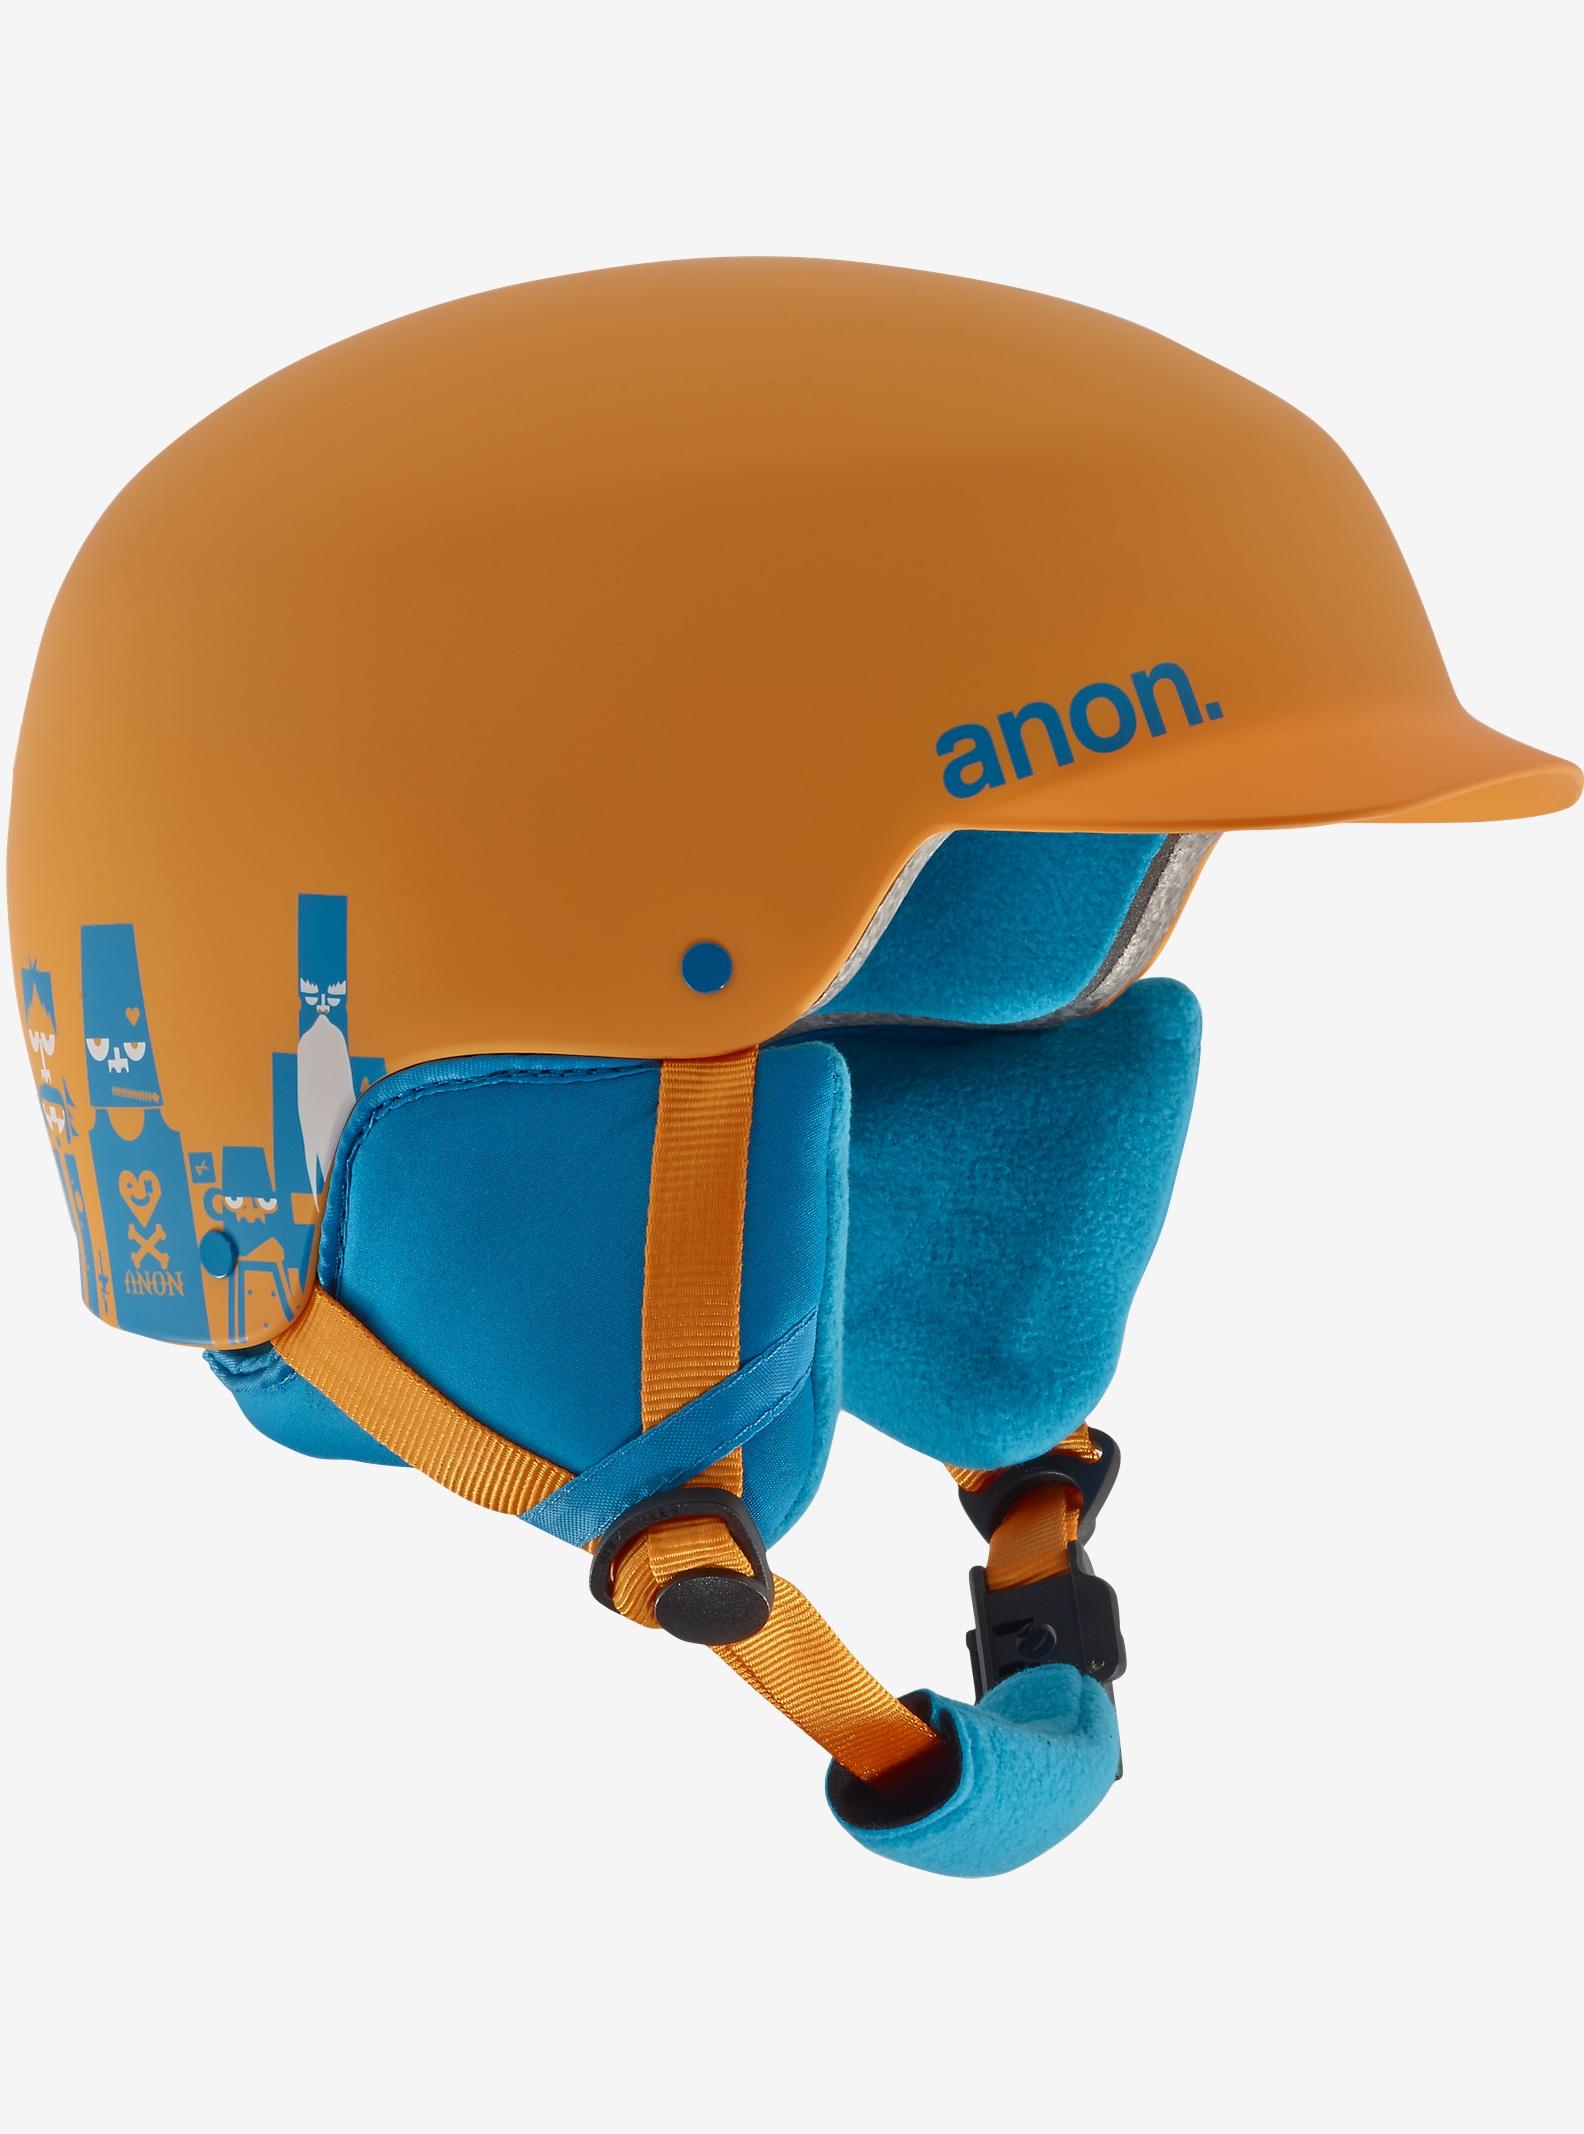 anon. Boys' Scout Helmet shown in Motley Orange